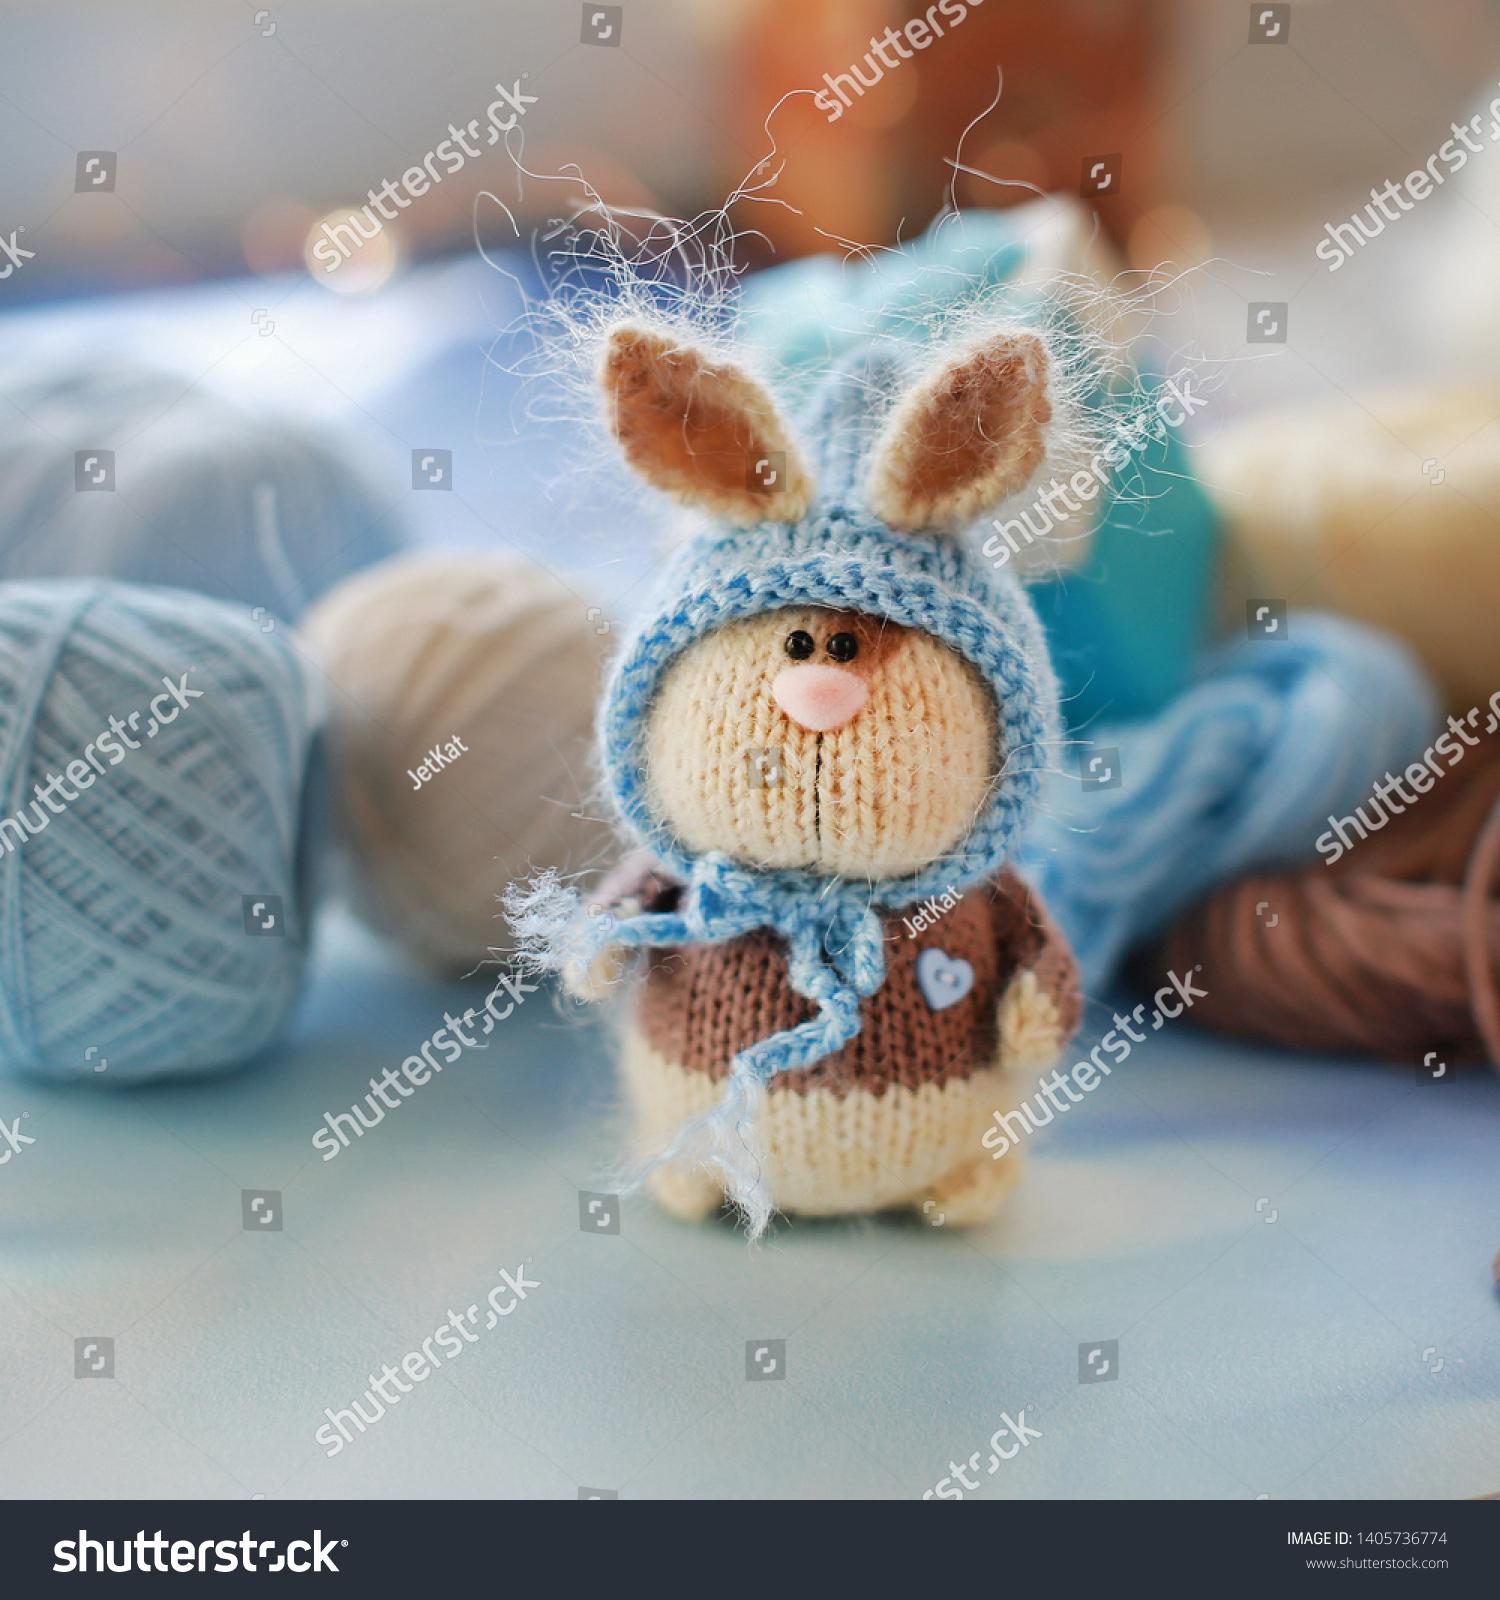 Candy Bunny Amigurumi Pattern | Crochet bunny pattern, Easter ... | 1600x1500